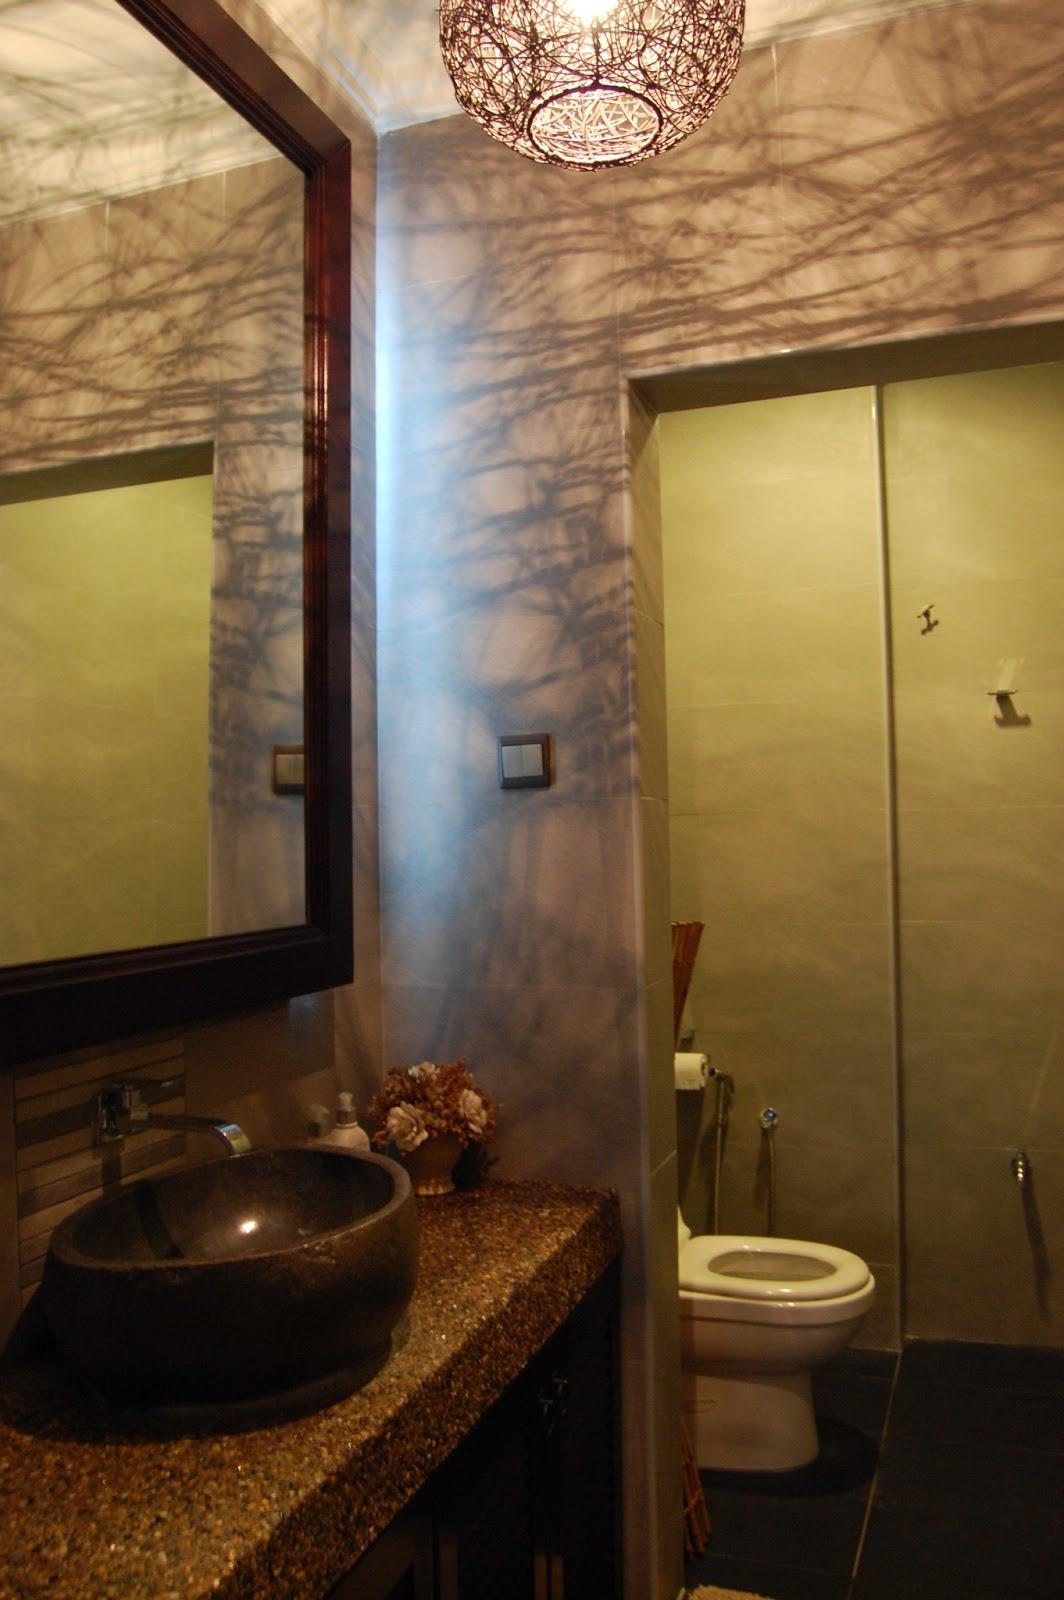 Interior Design Malaysia The Rattan Lighting Creates Interesting Shadow Effects On Walls In Bathroom